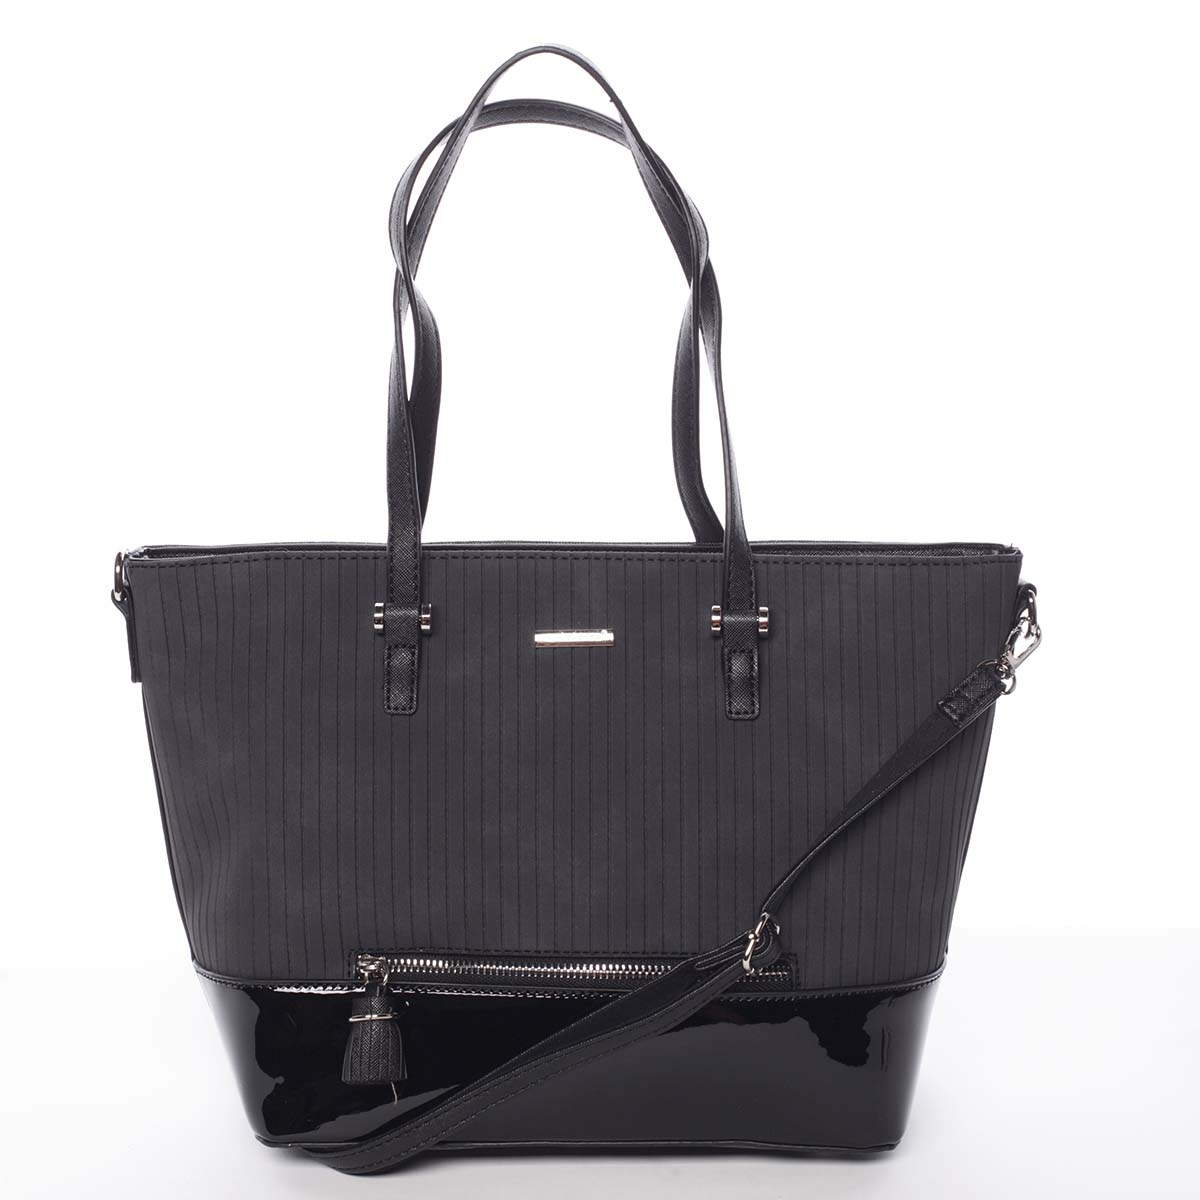 Originálna dámska čierna kabelka - David Jones Breanna čierna